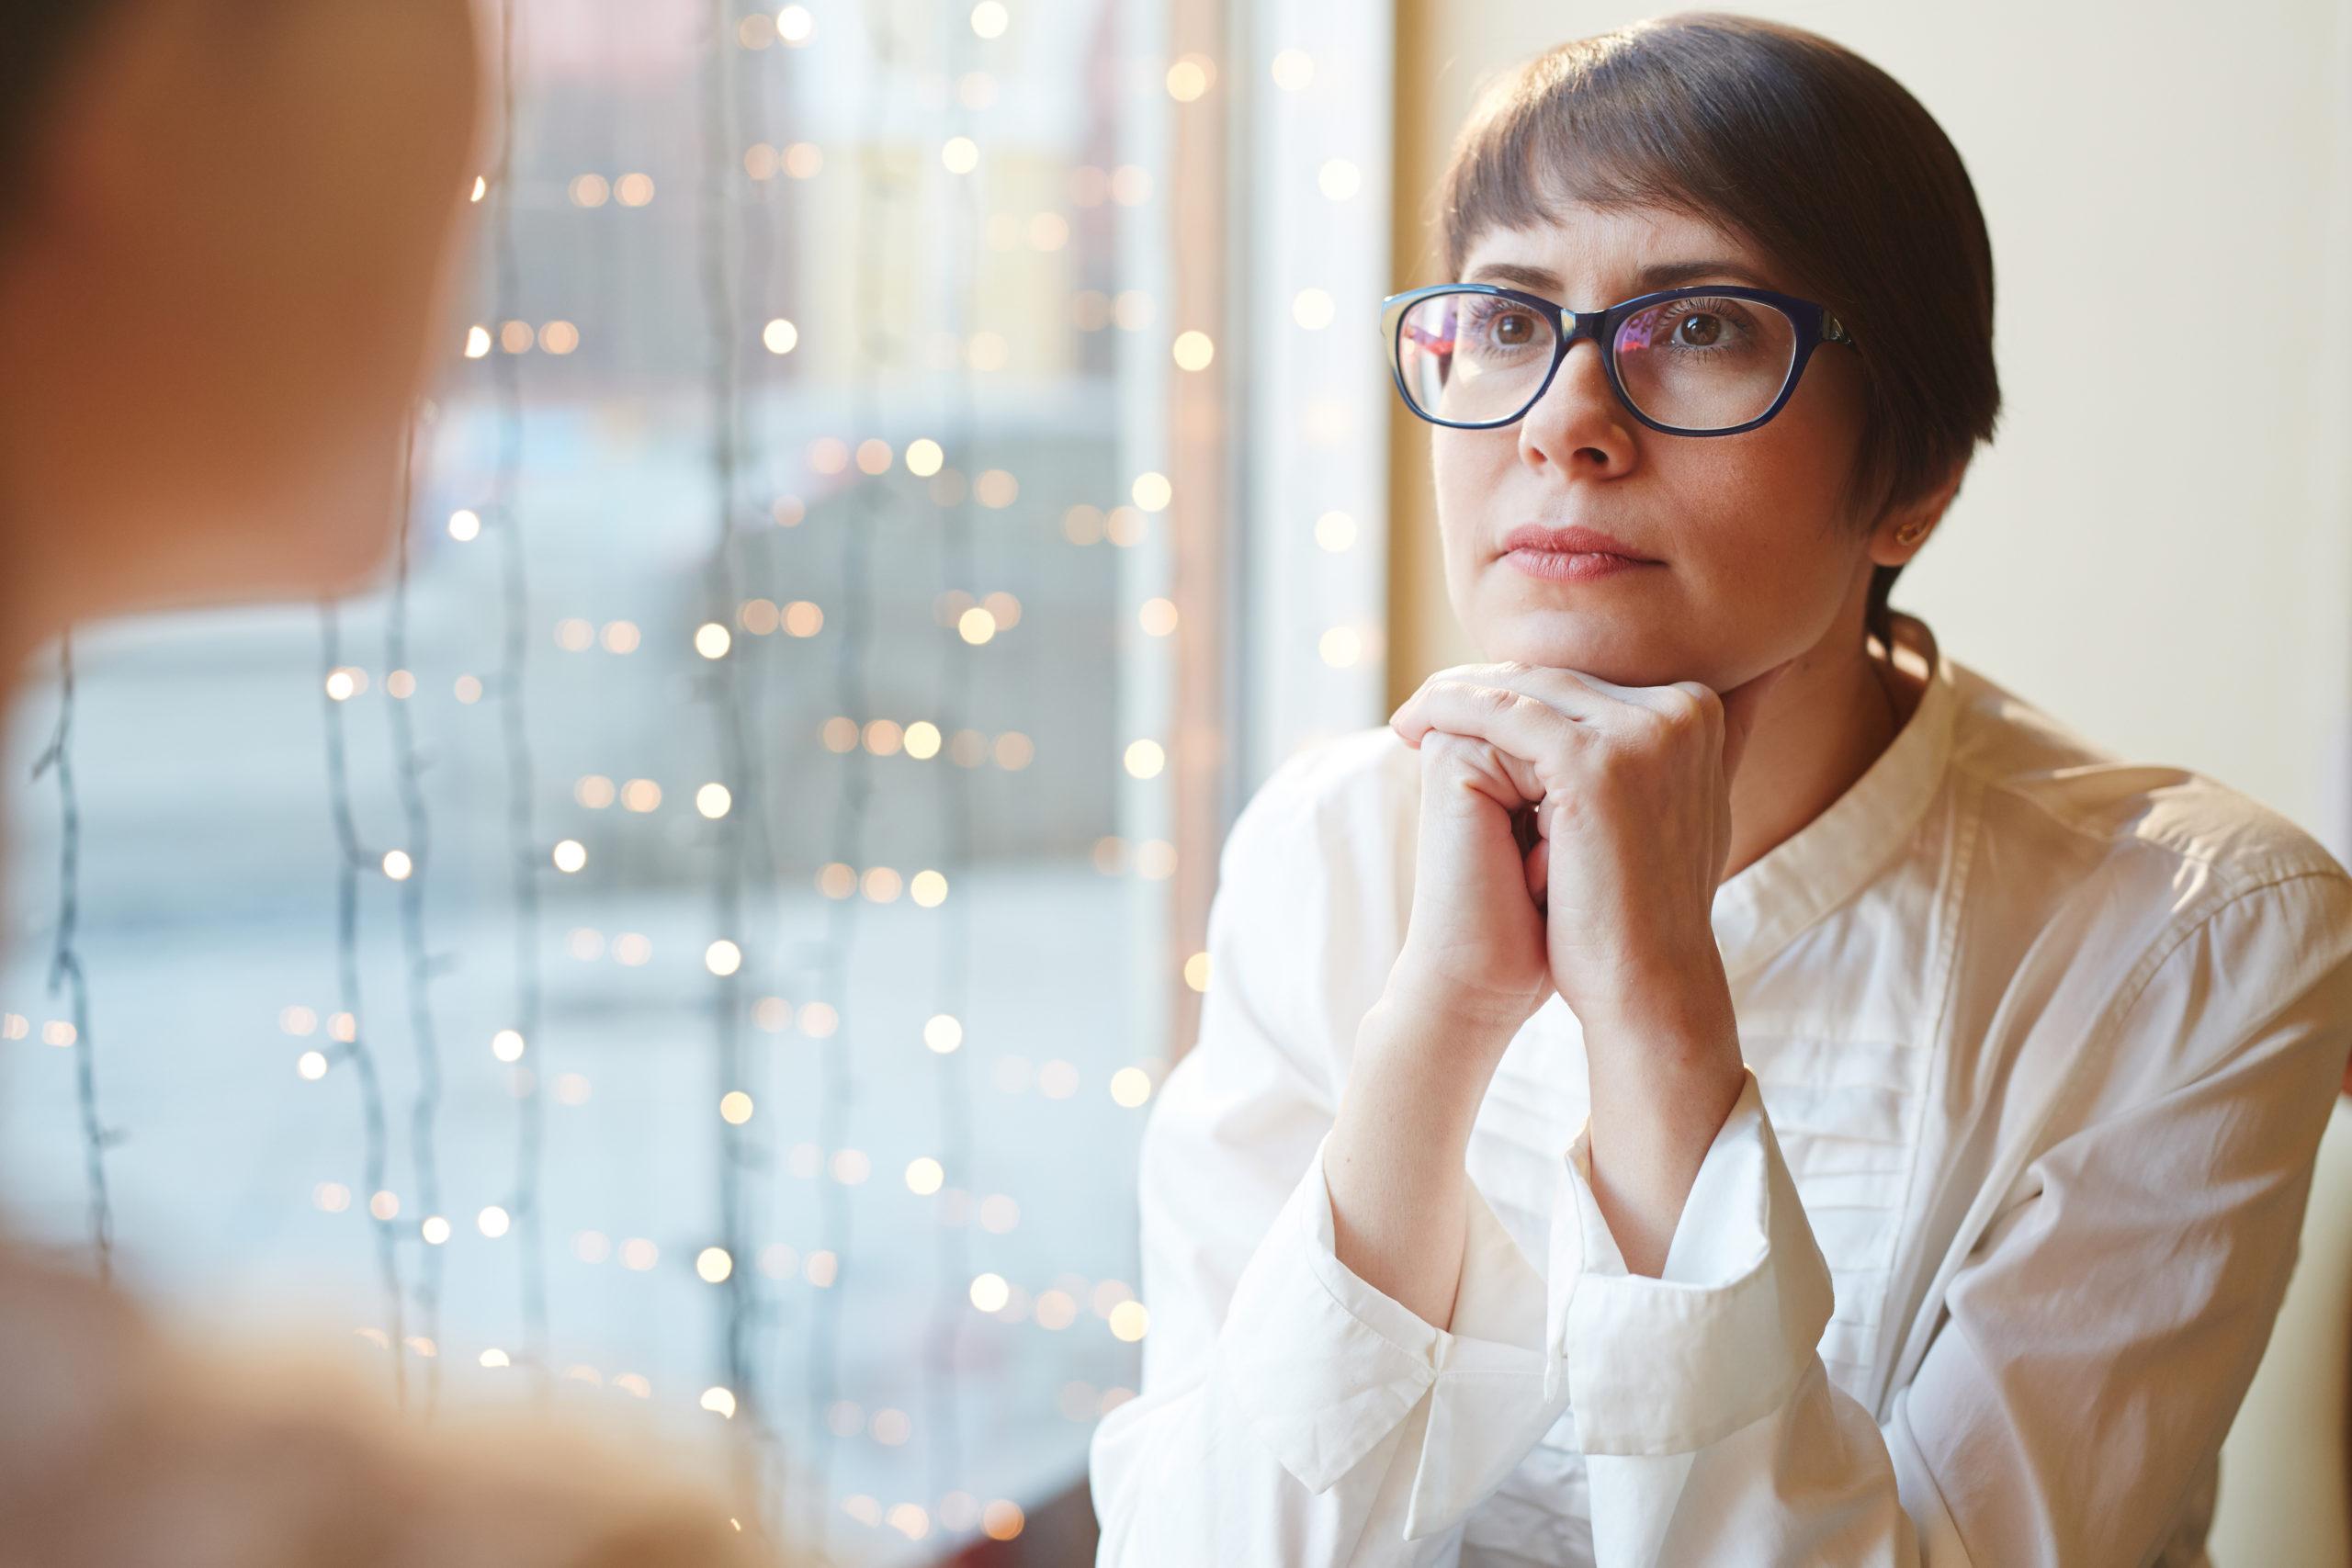 Denver MedSpa provider listening closely to patient